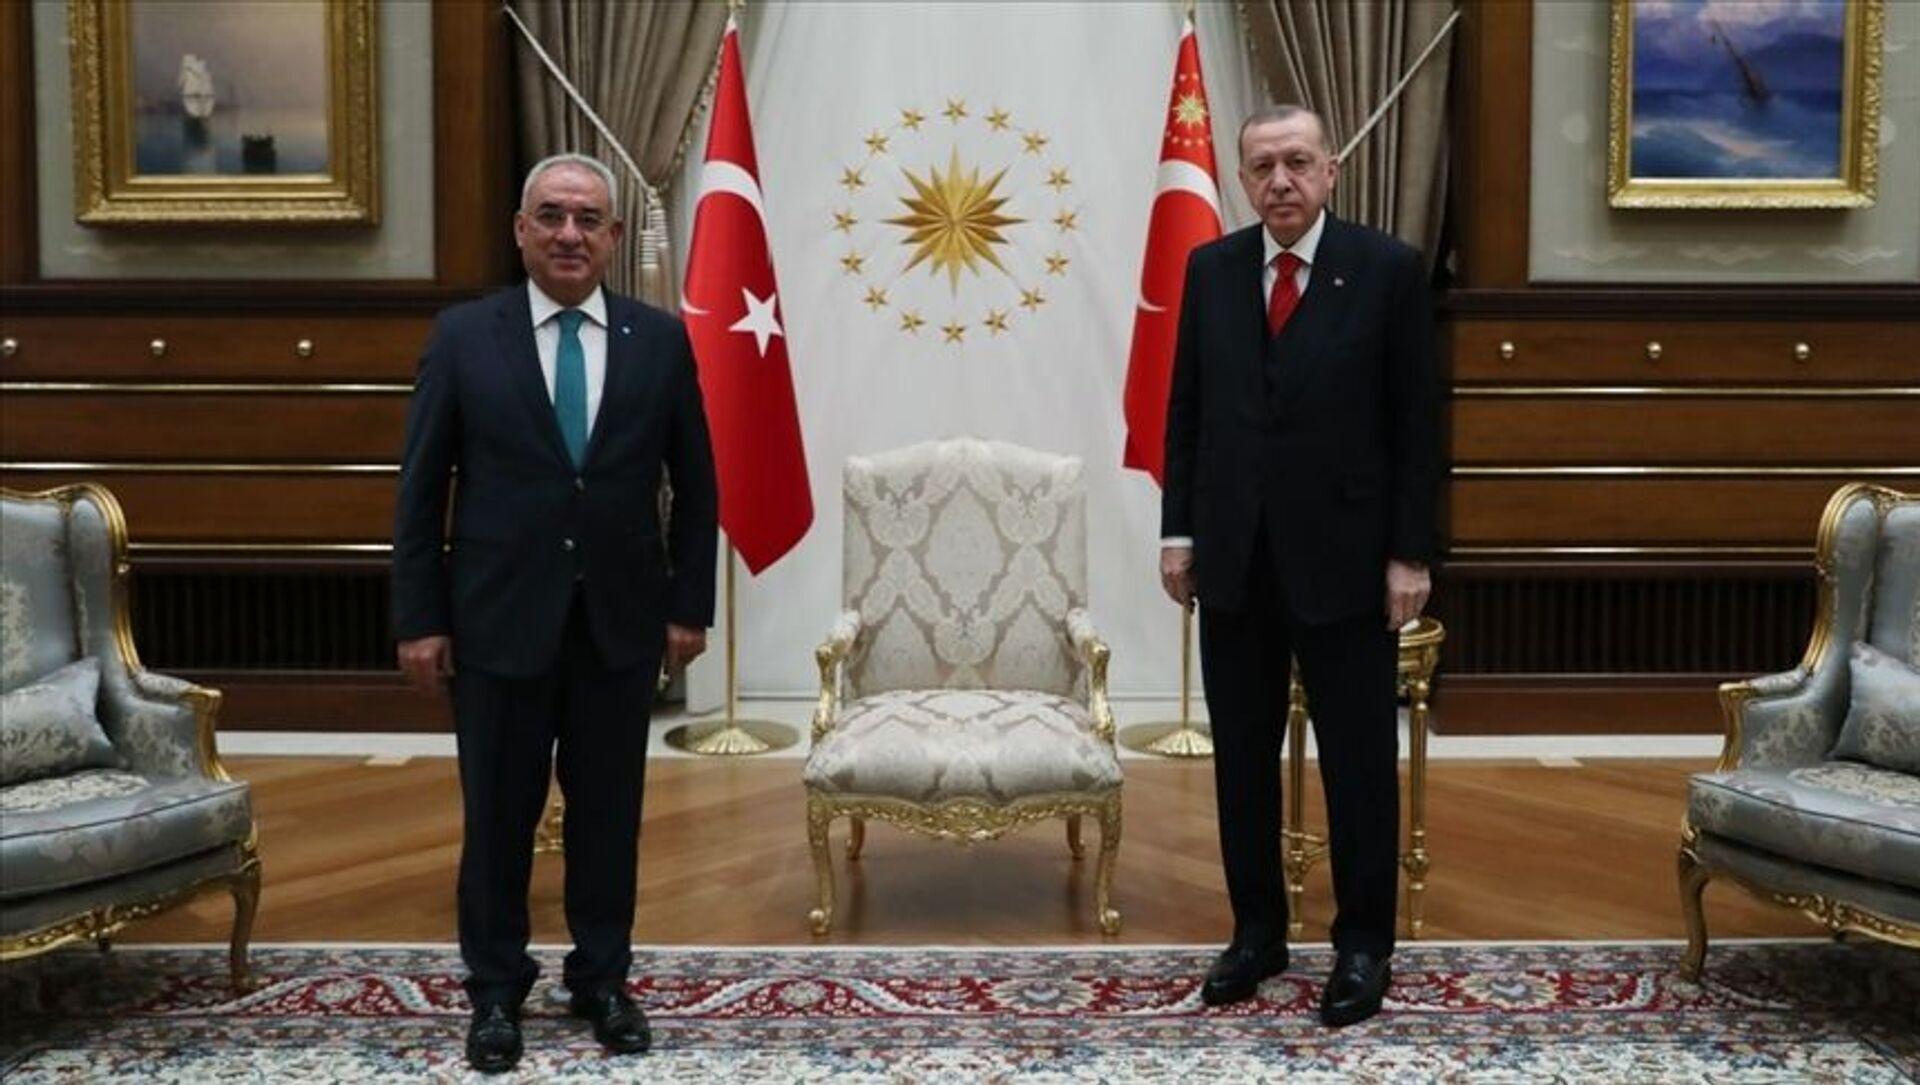 önder aksakal - Sputnik Türkiye, 1920, 26.07.2021